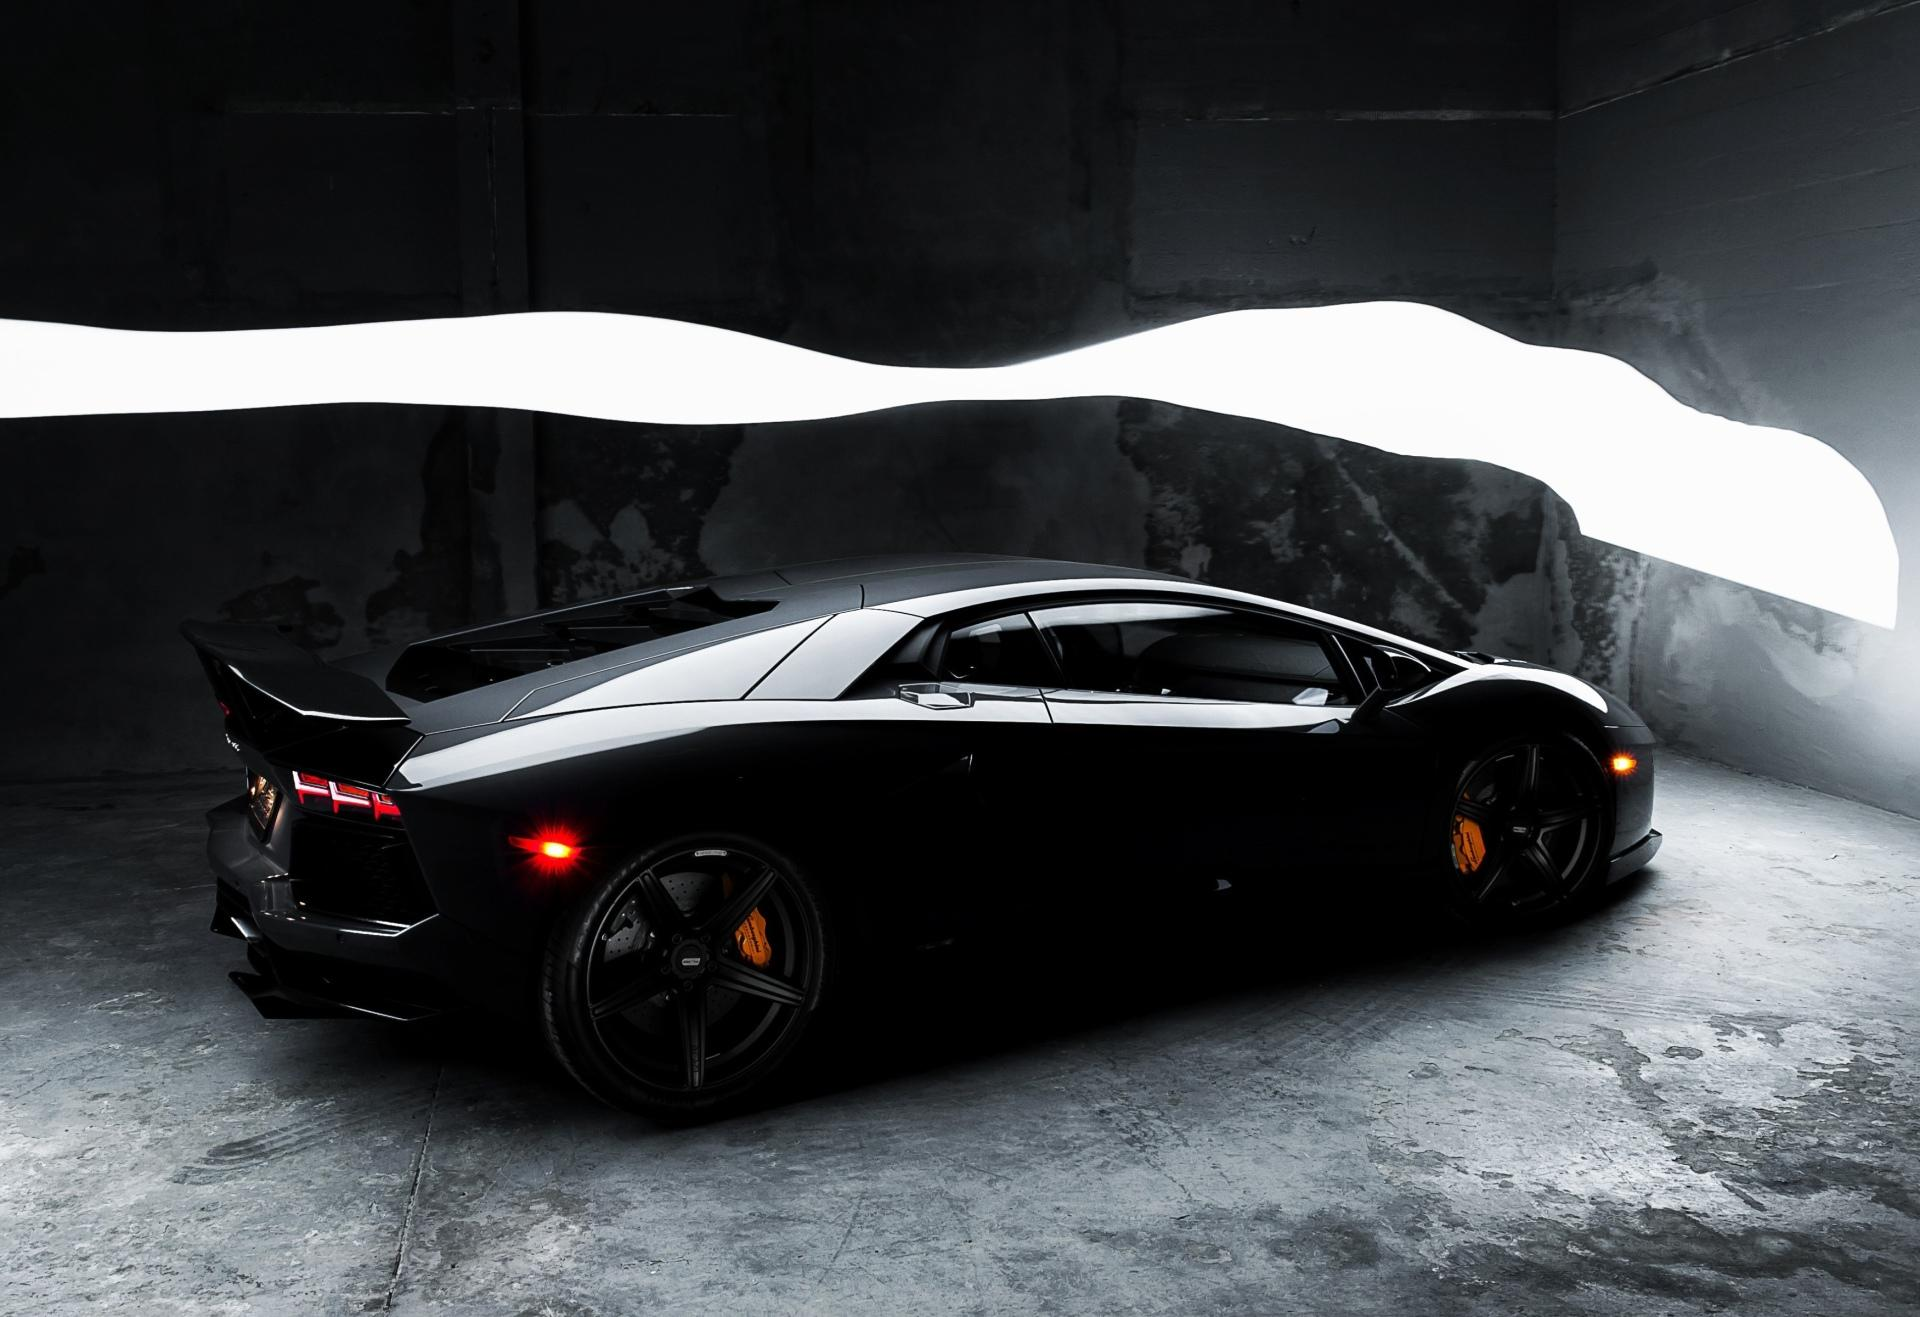 Lamborghini Aventador Lp 700 4 Wallpaper Hd Download